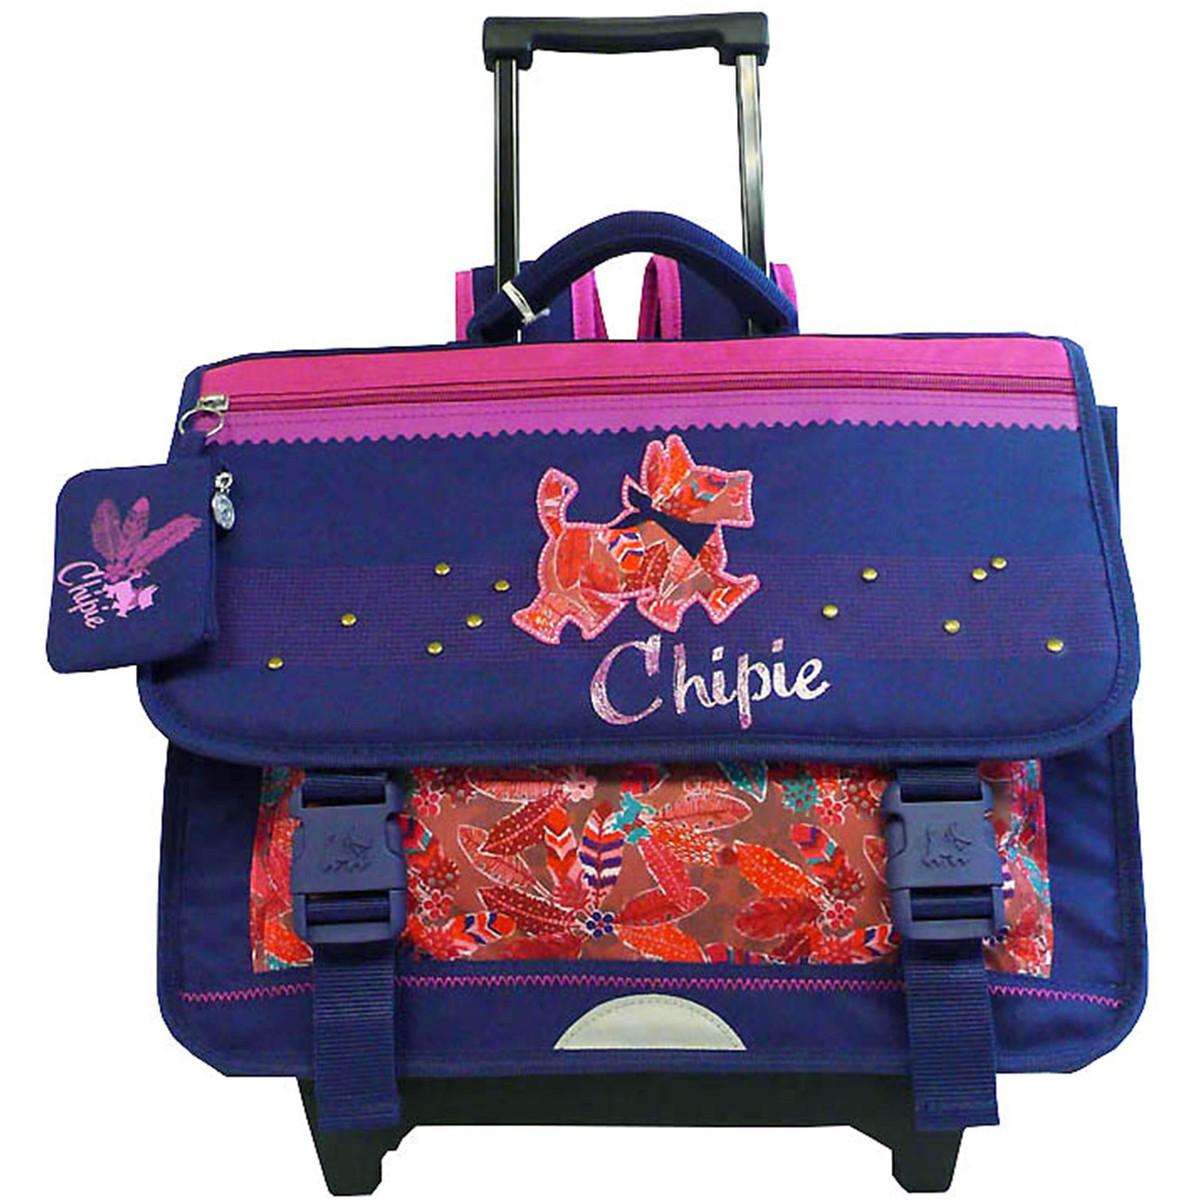 searchCartable CA roulette Chipie